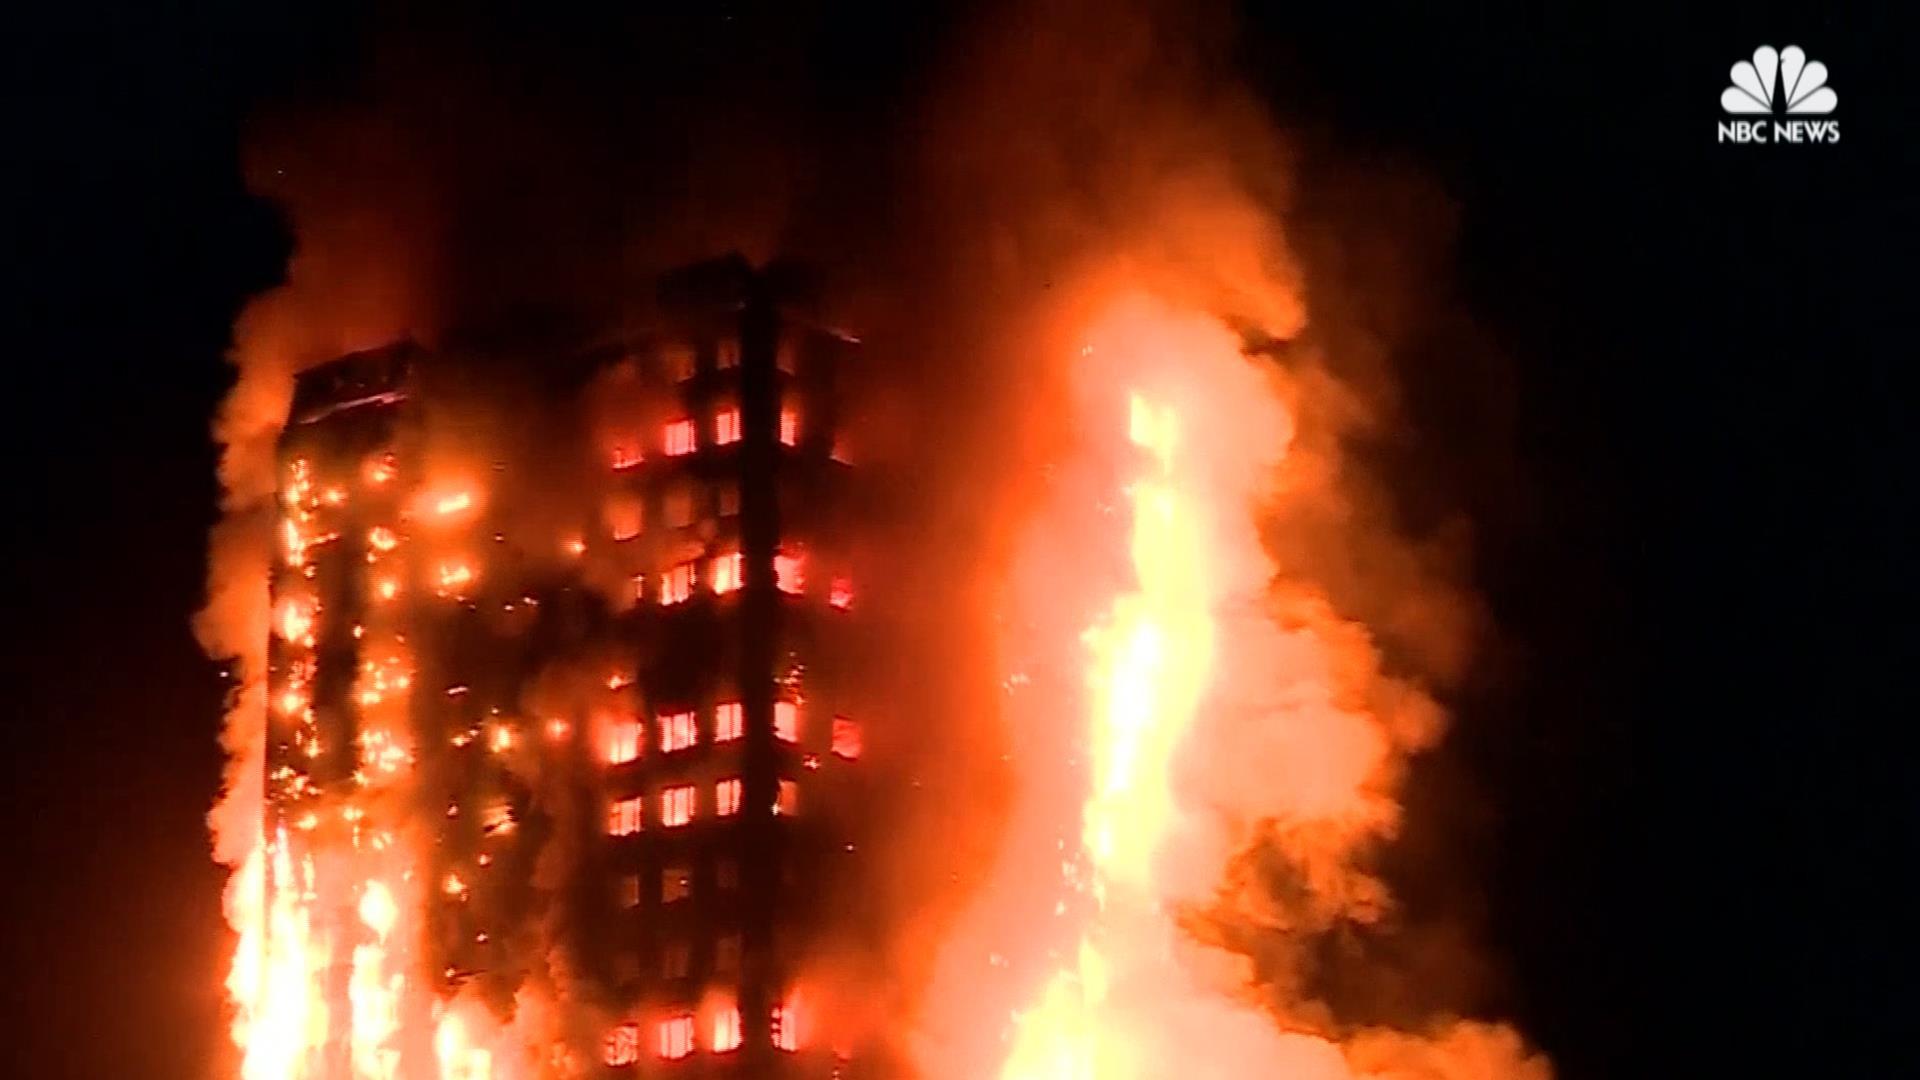 London Apartment Building Burns In Massive Fire Nbc News